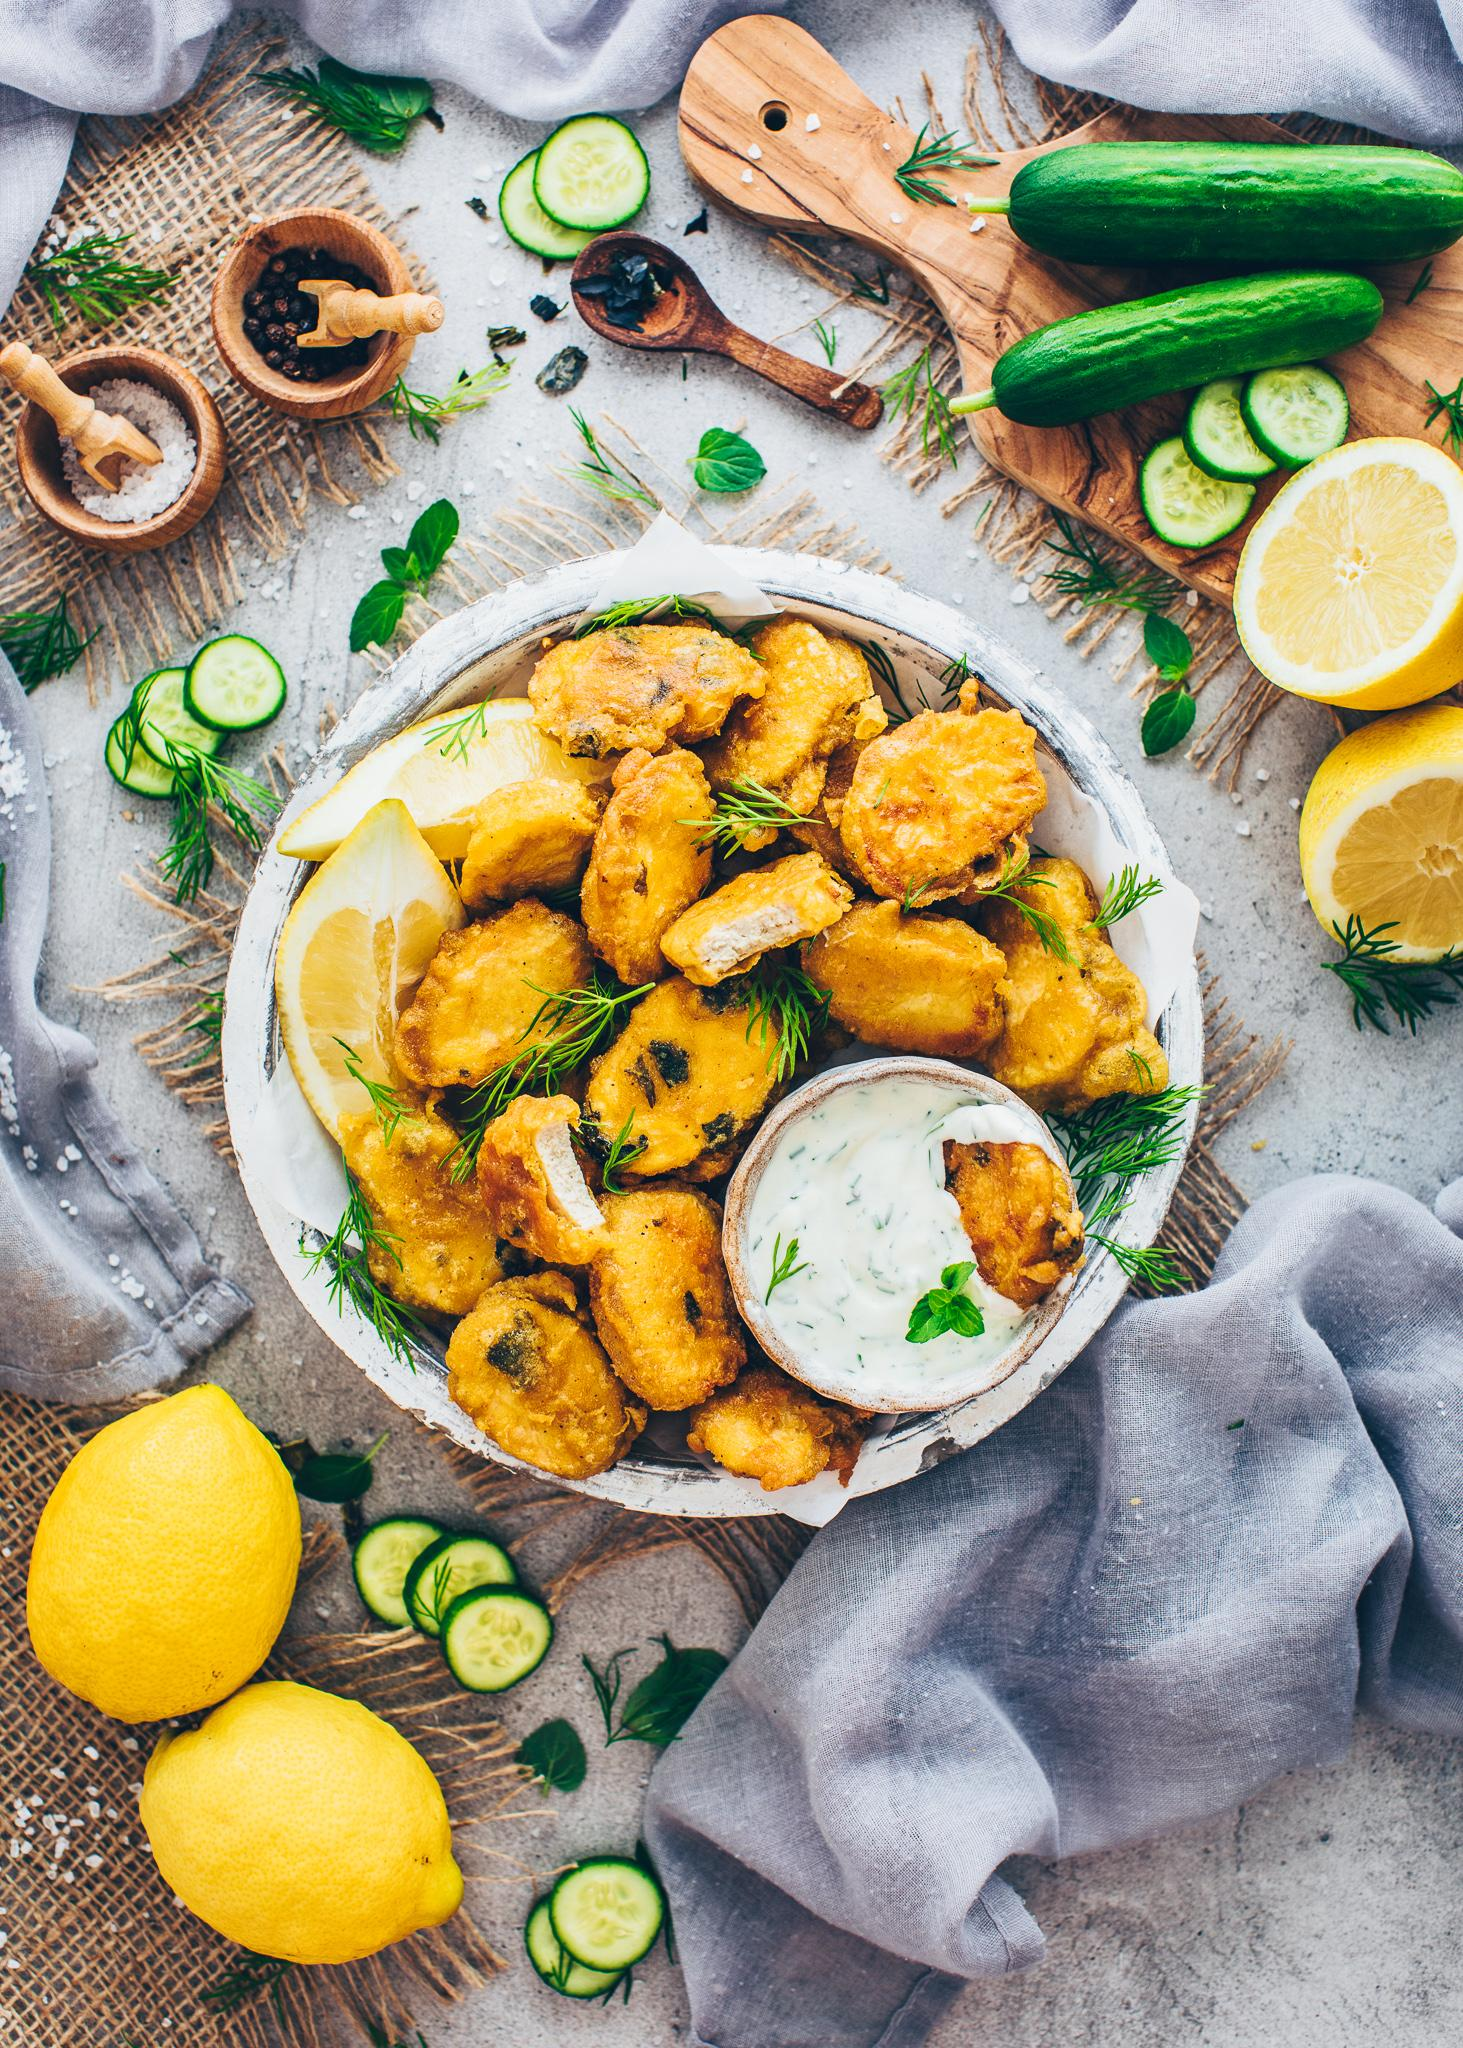 Crispy Vegan Fish Nuggets with Dill Dip